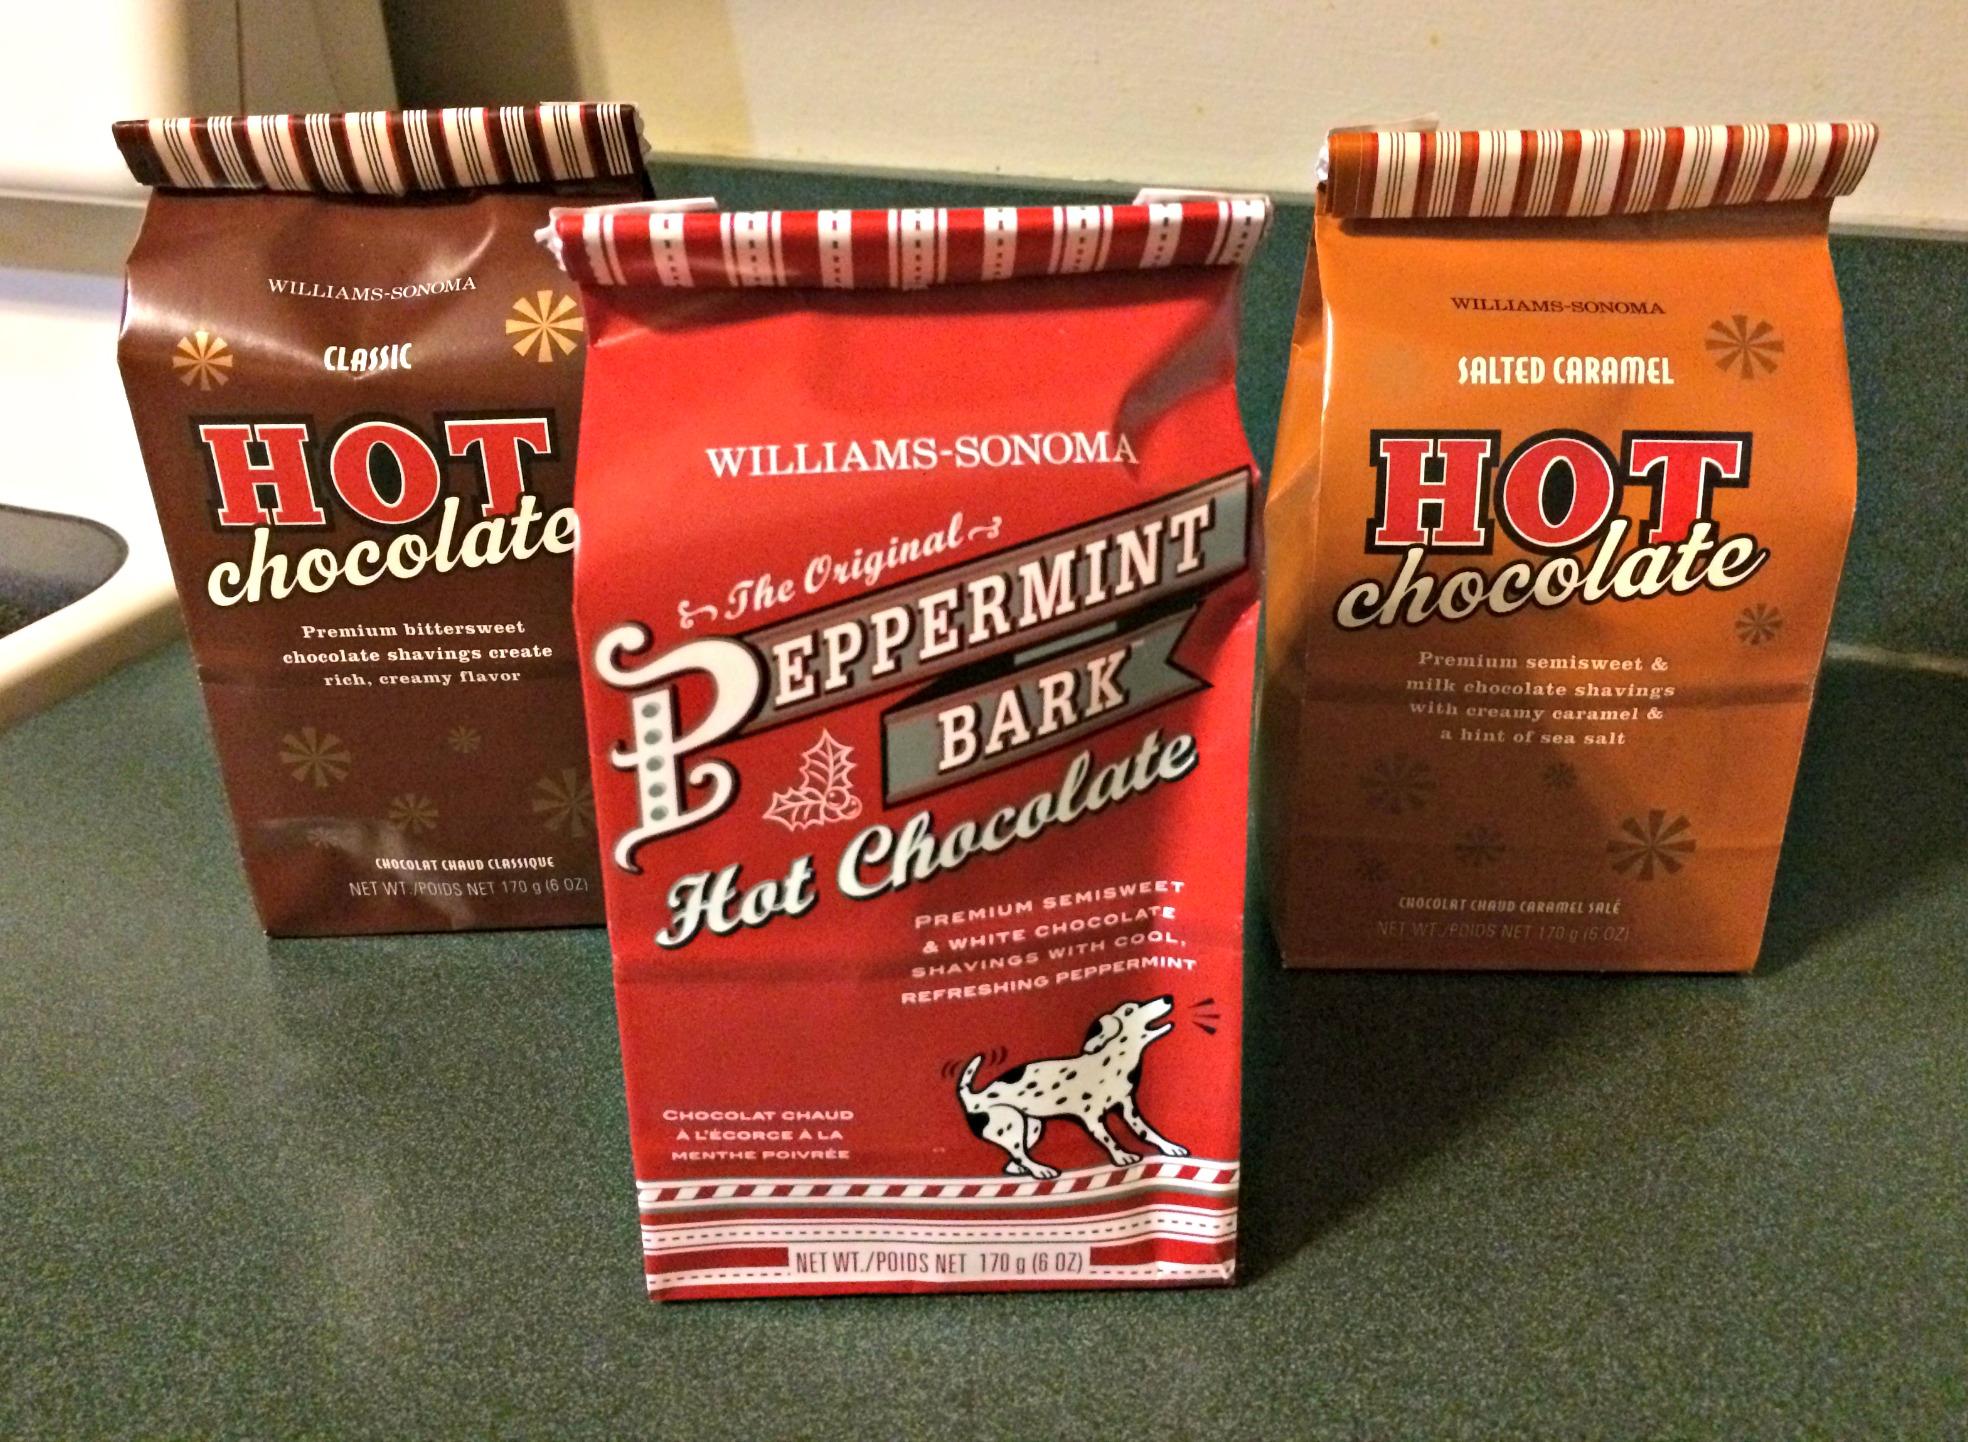 williams-sonoma hot chocolate